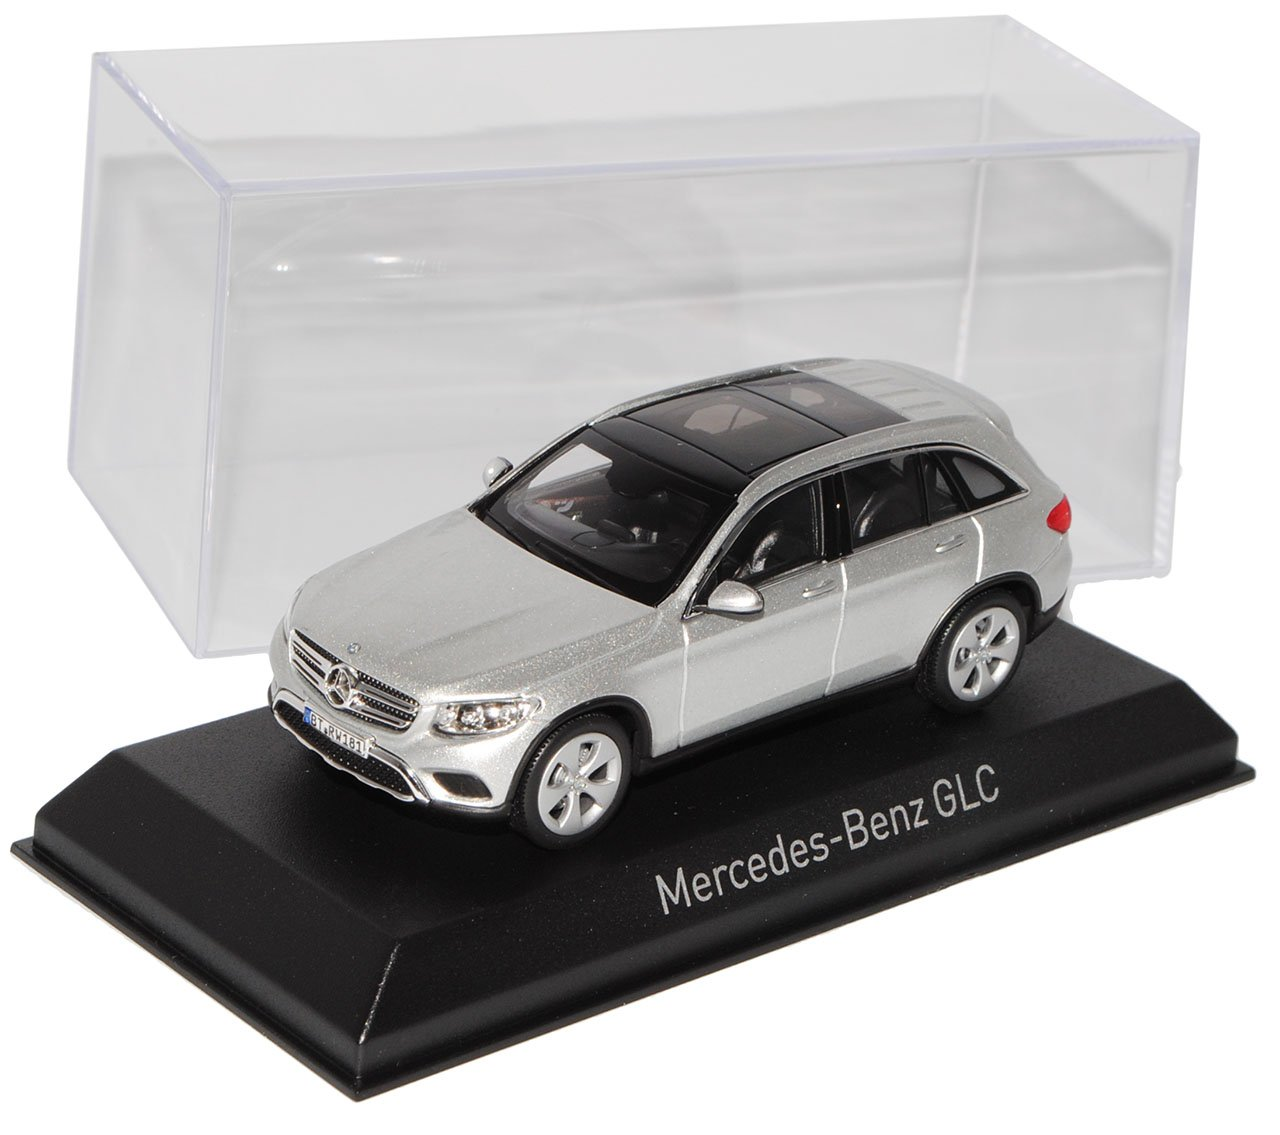 Norev Mercedes-Benz GLC X253 SUV Silber Metallic Ab 2015 1/43 Modell Auto